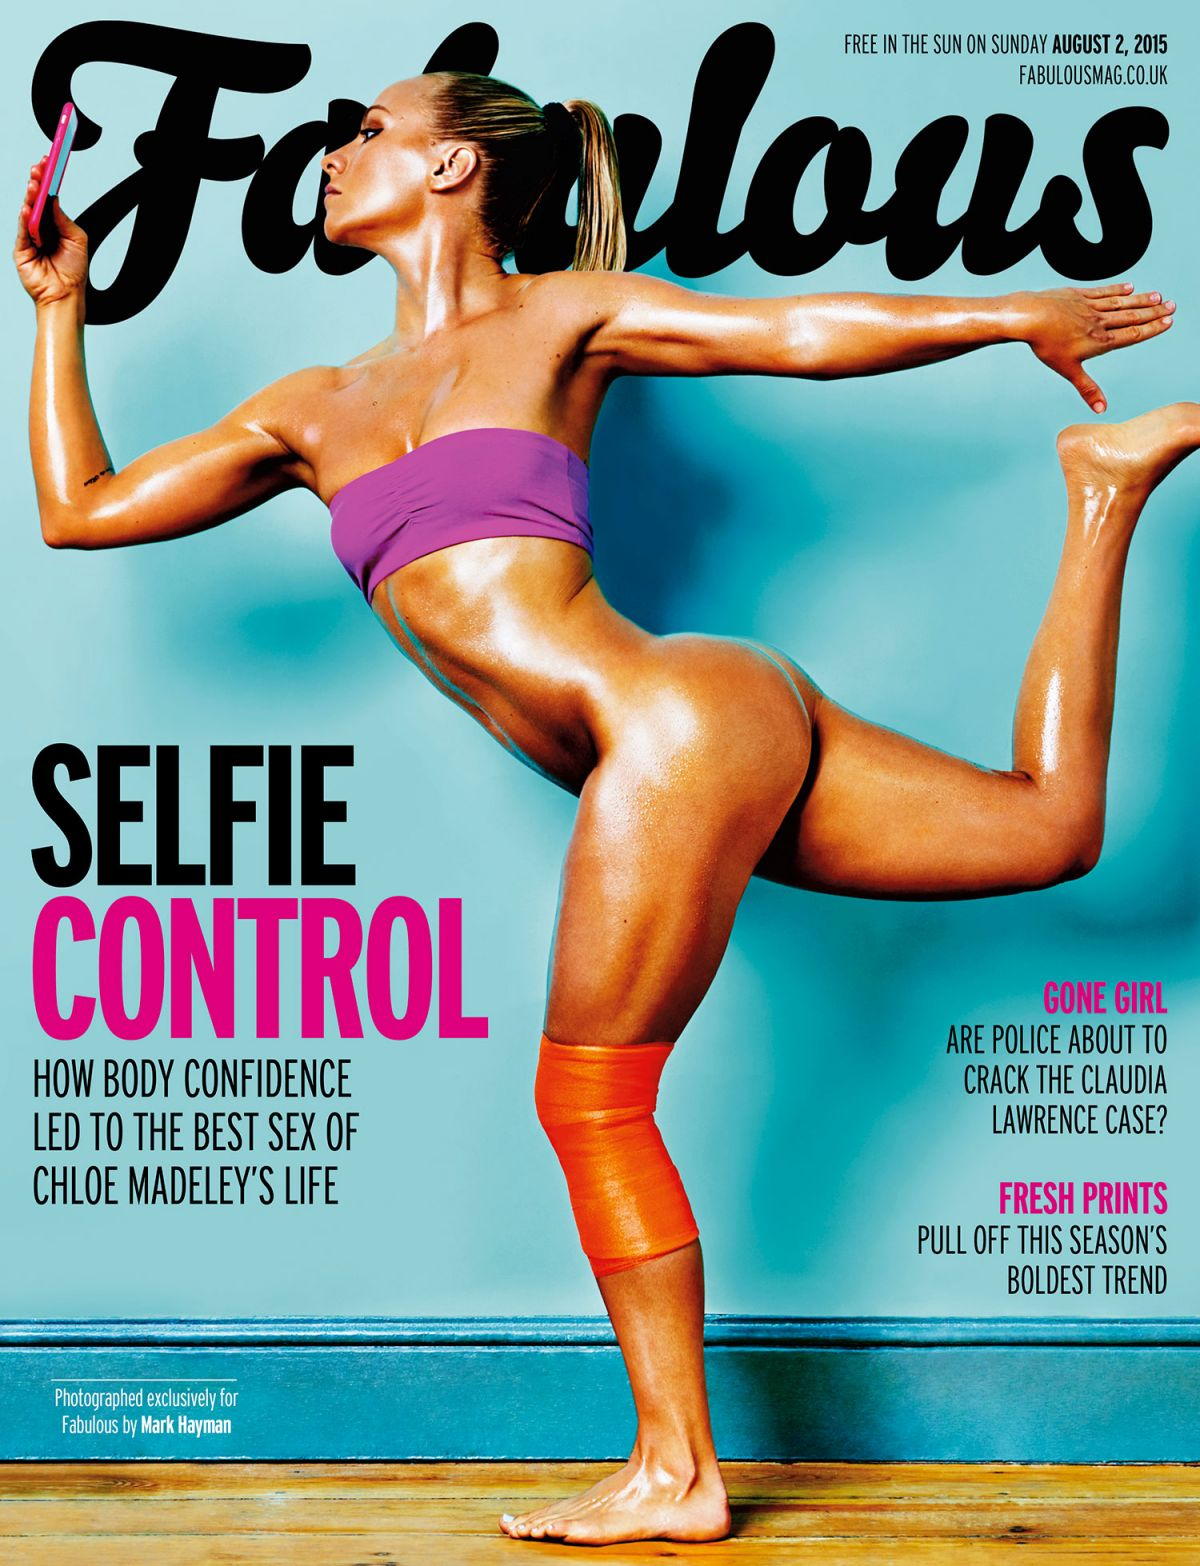 CHLOE MADELEY на обложке журнала Fabulous, август 2015 года.jpg